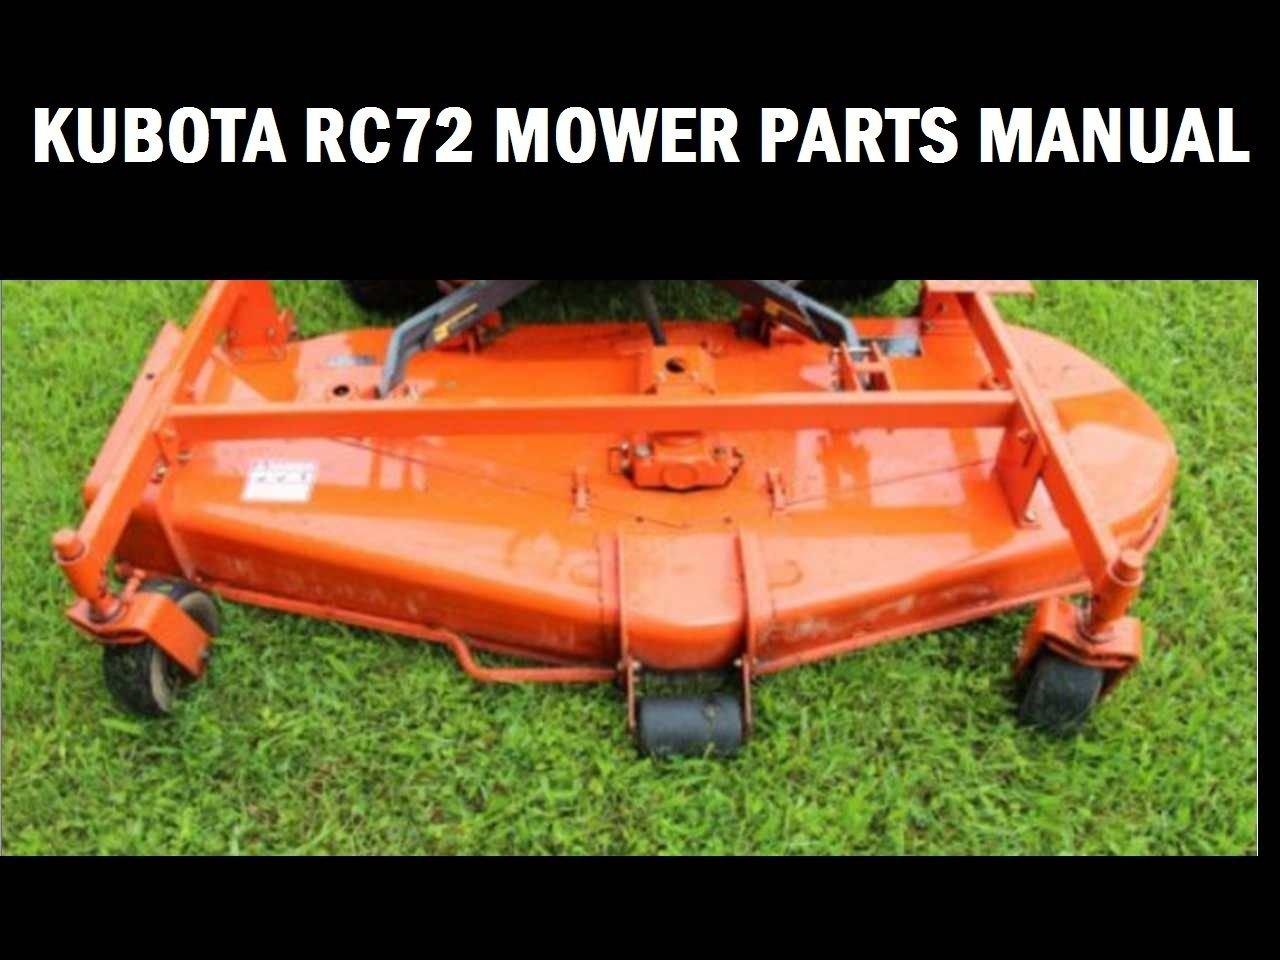 Kubota Rc72 Mower Parts Manuals For Rc72